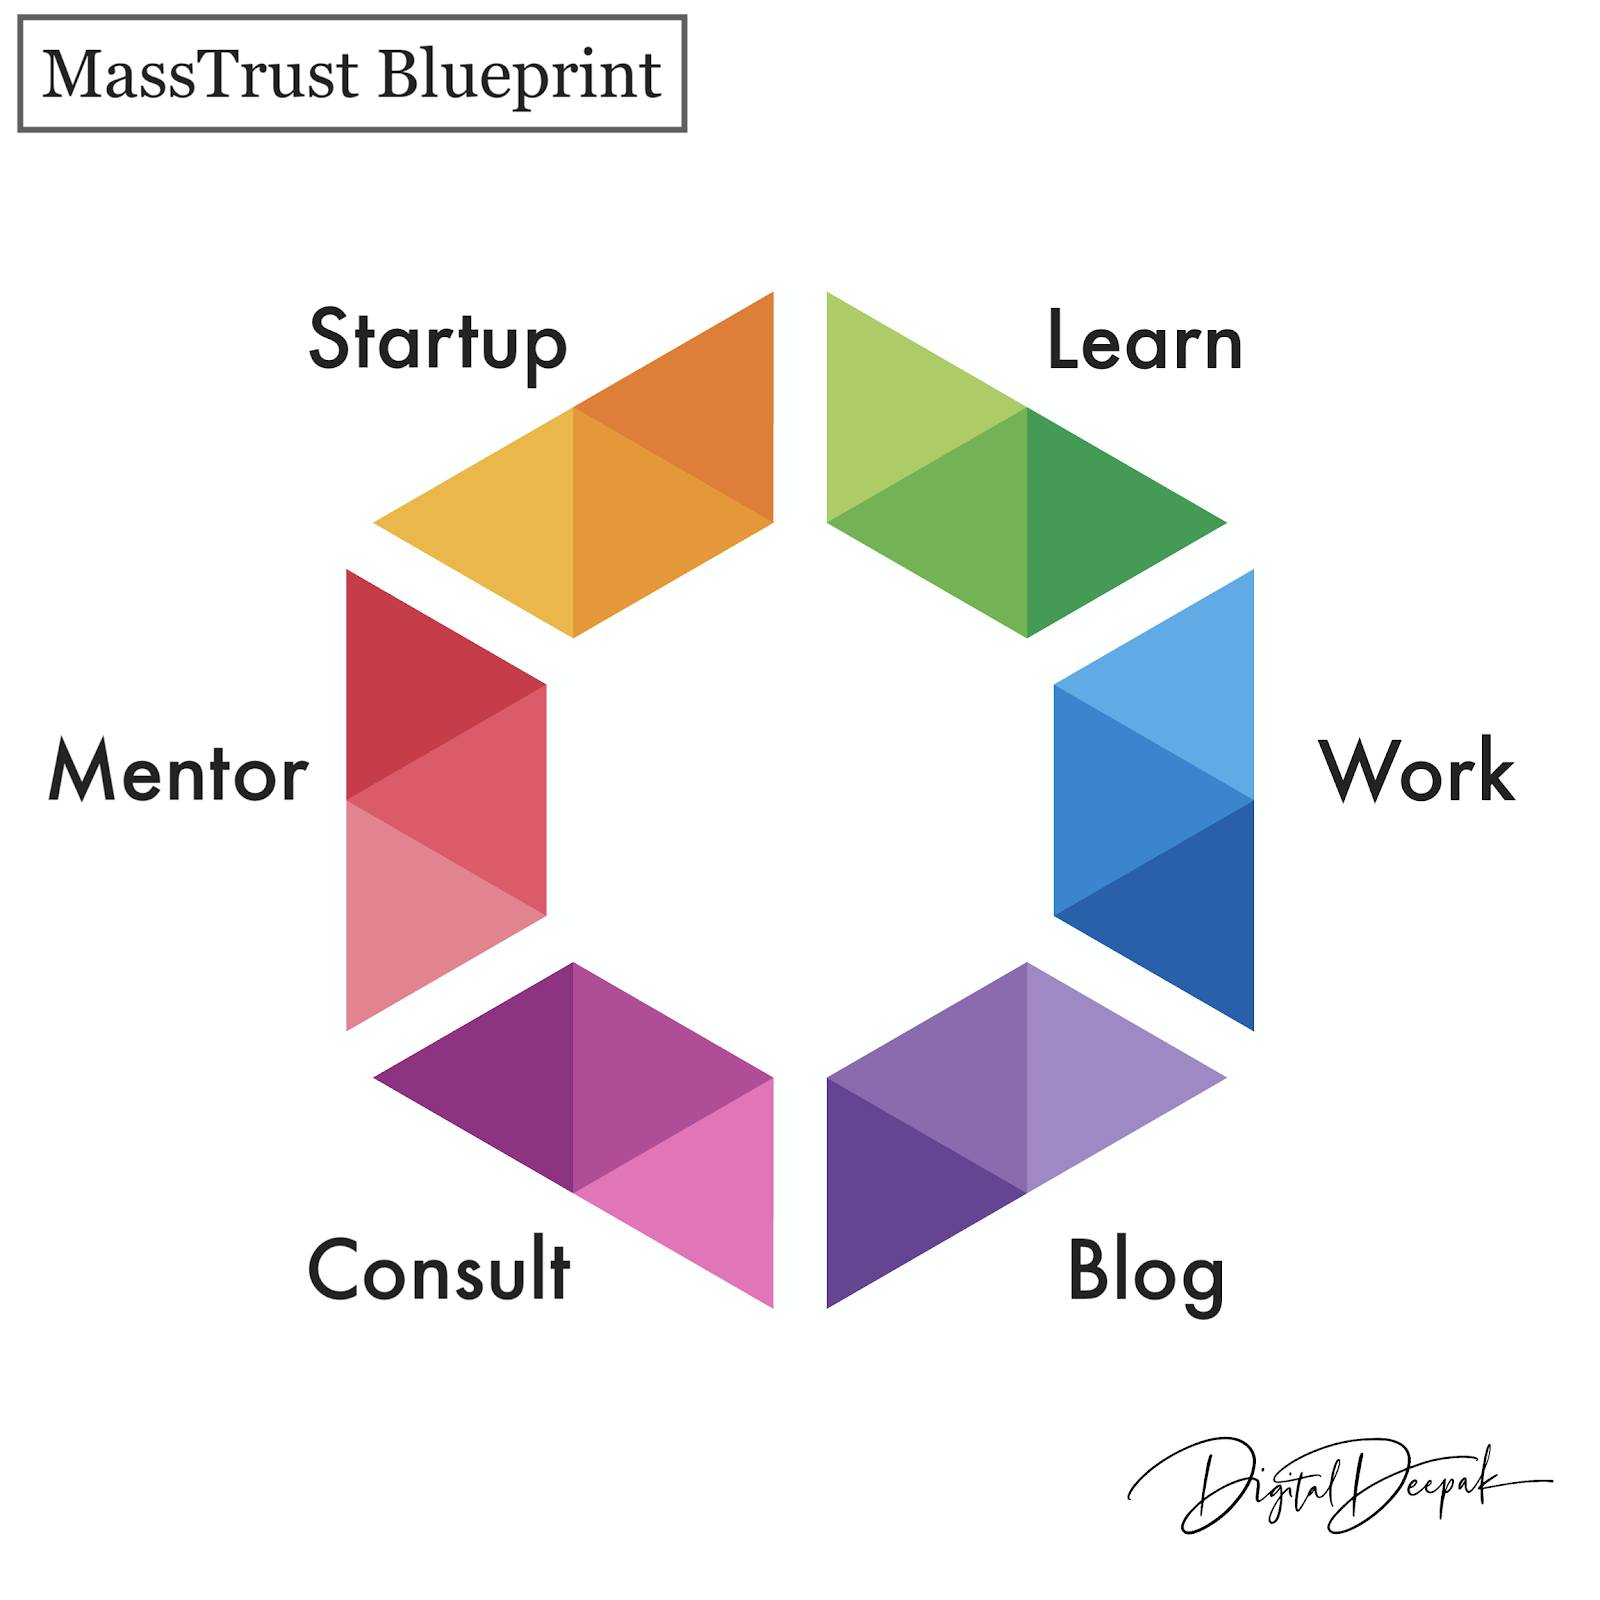 Mass Trust blueprint- digital marketing, digital marketing strategy with examples